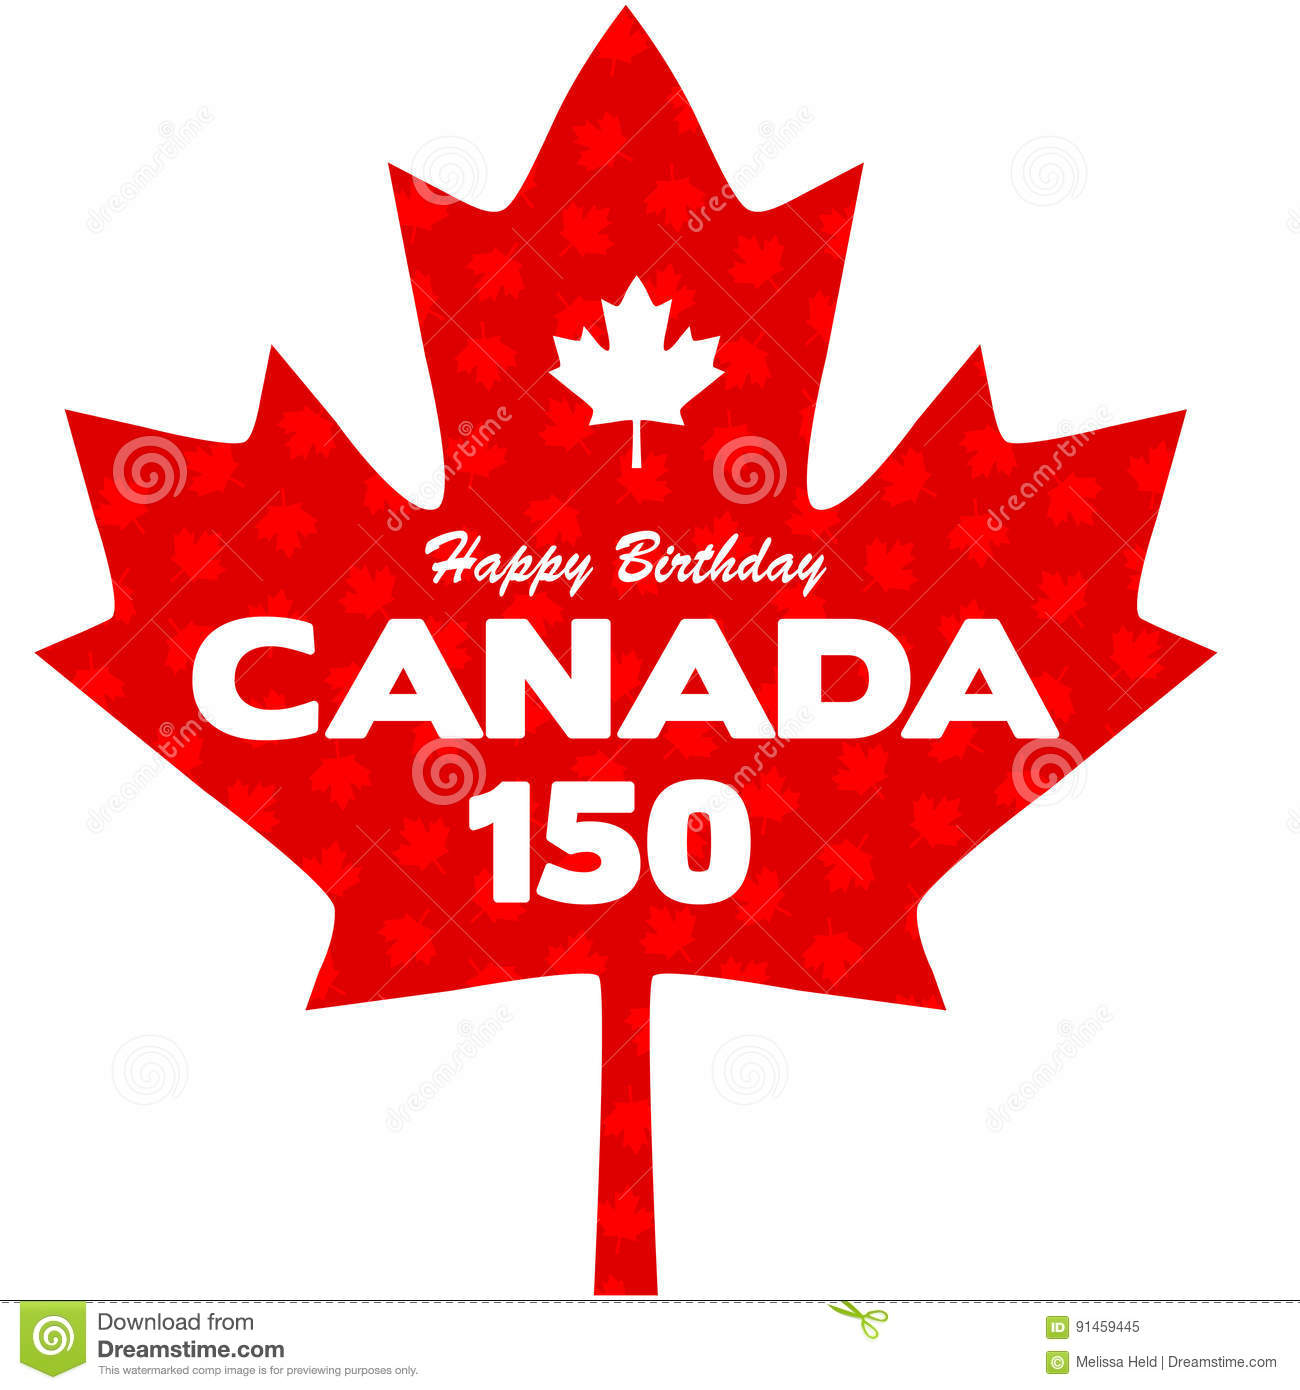 Happy 150 Birthday Canada Graphic Stock Vector.